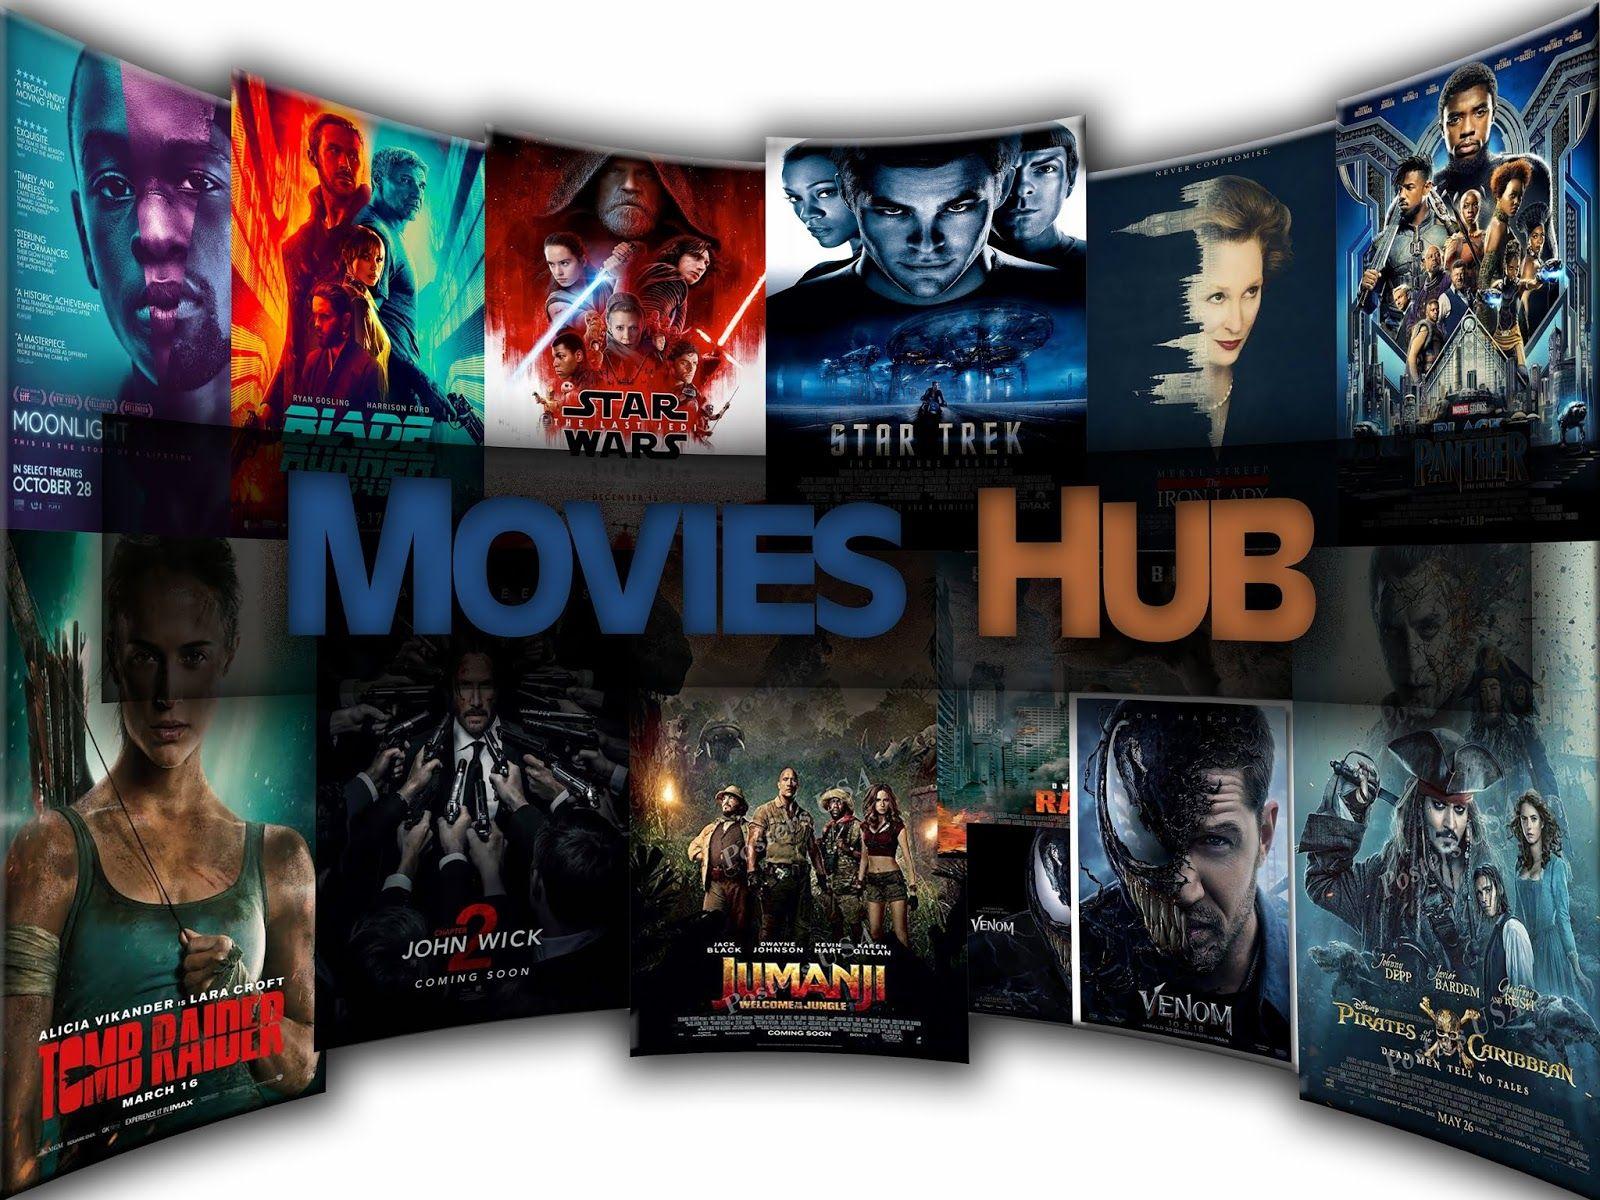 2020 Best Movies Free Download Websites Good Movie Websites Movie Website Good Movies